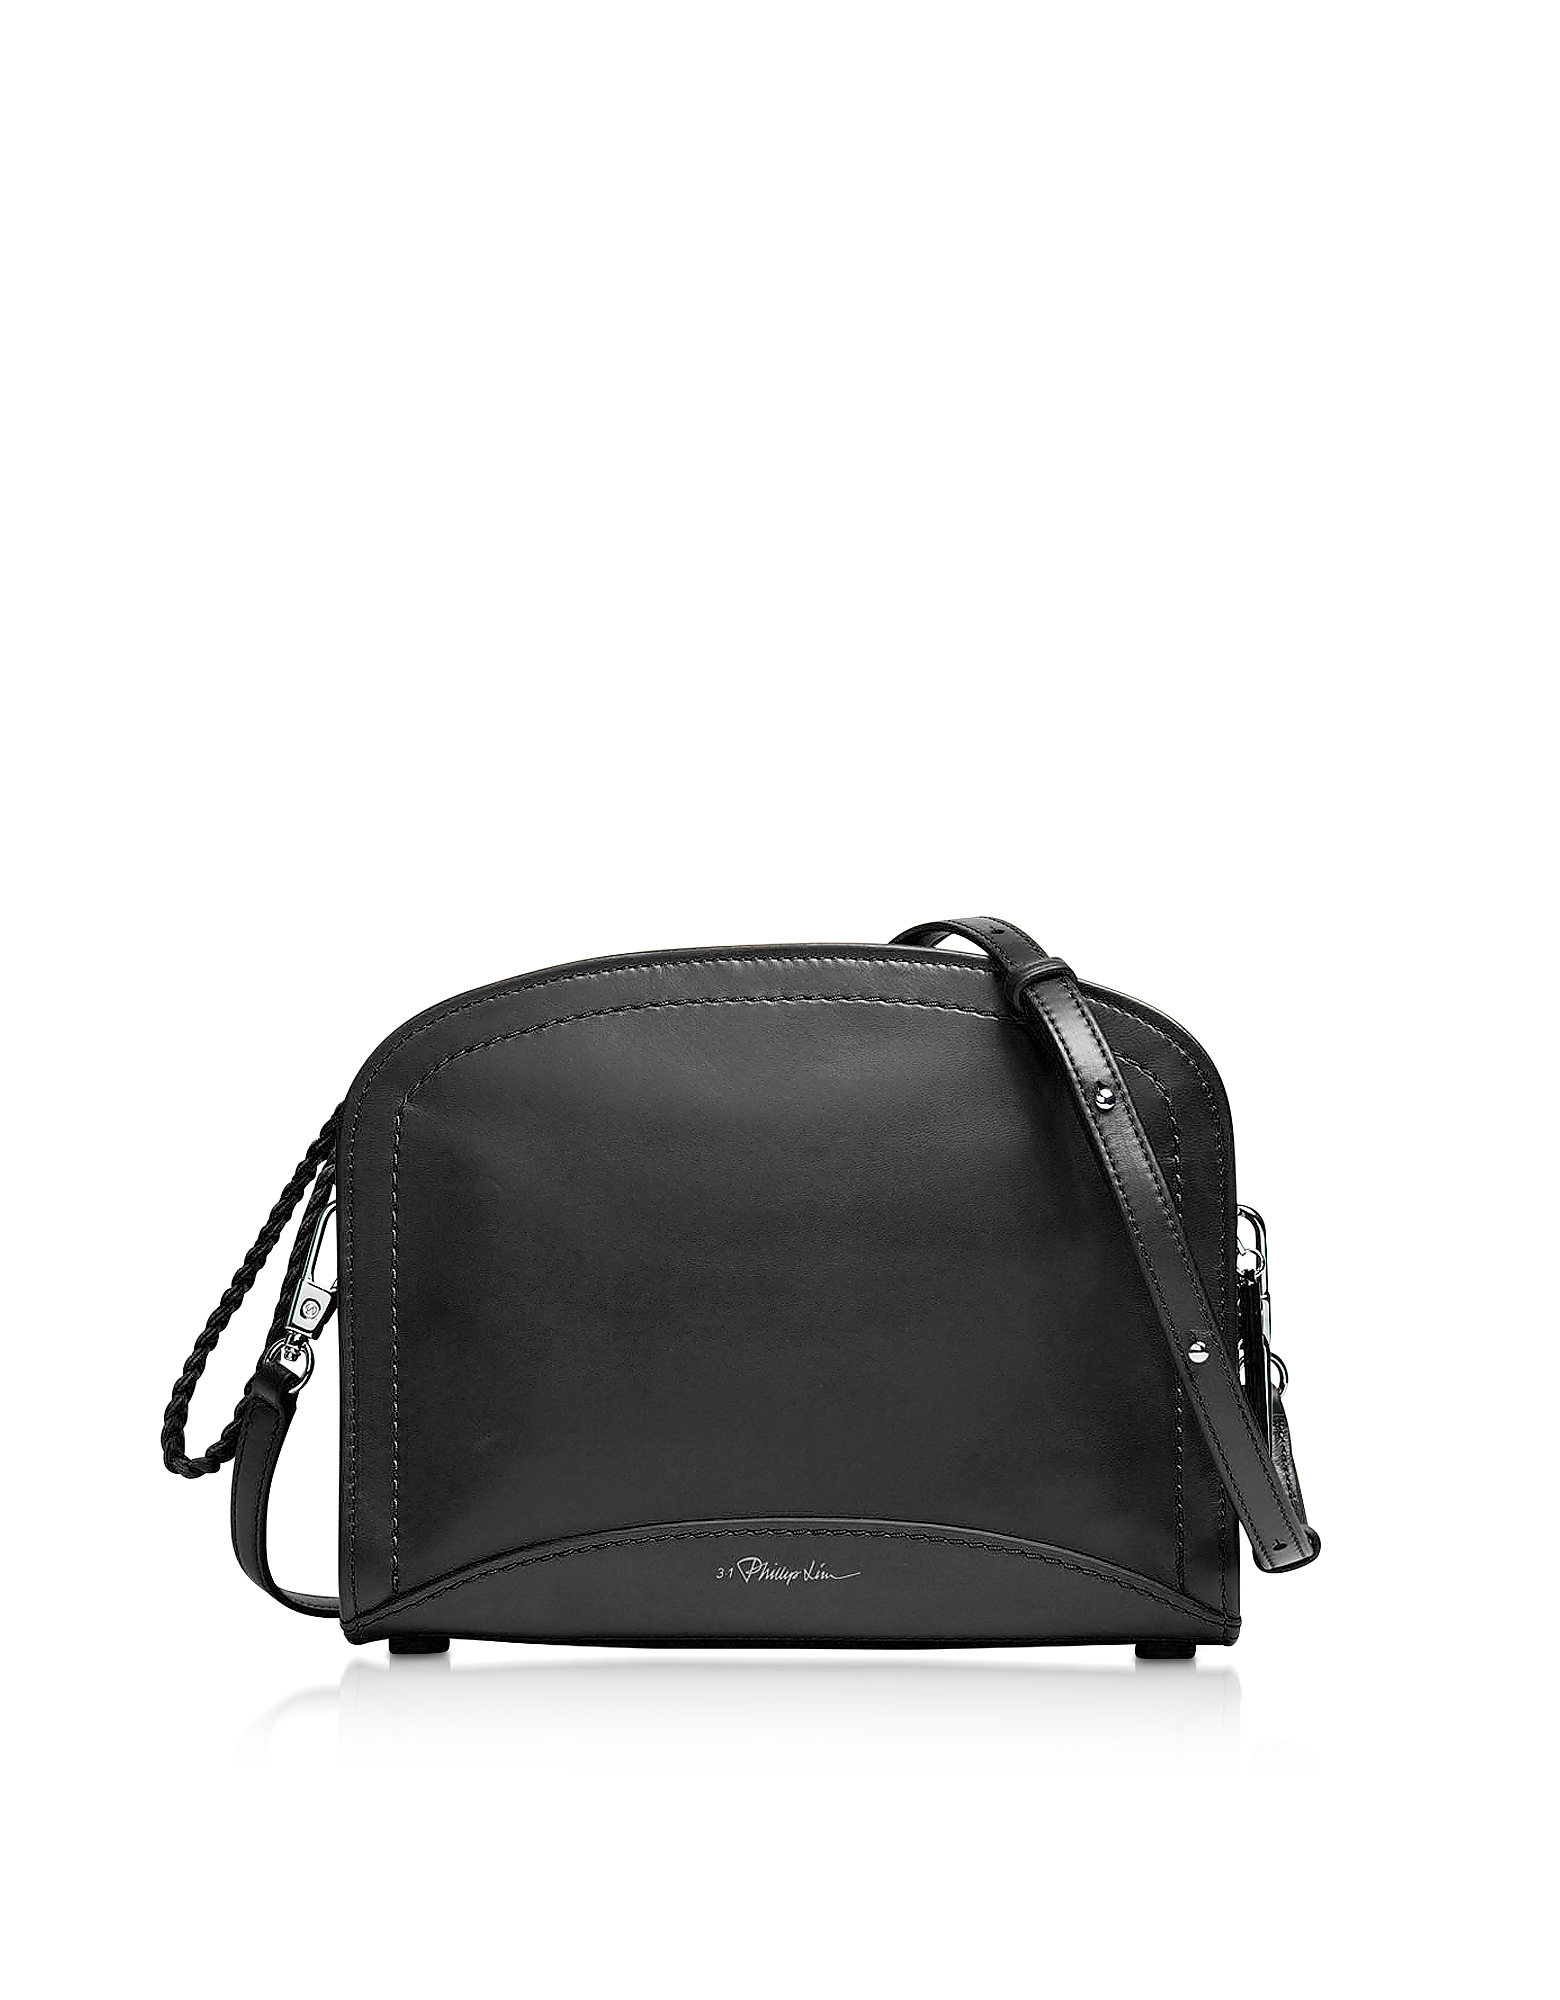 Hudson Small Rectangle Crossbody Bag